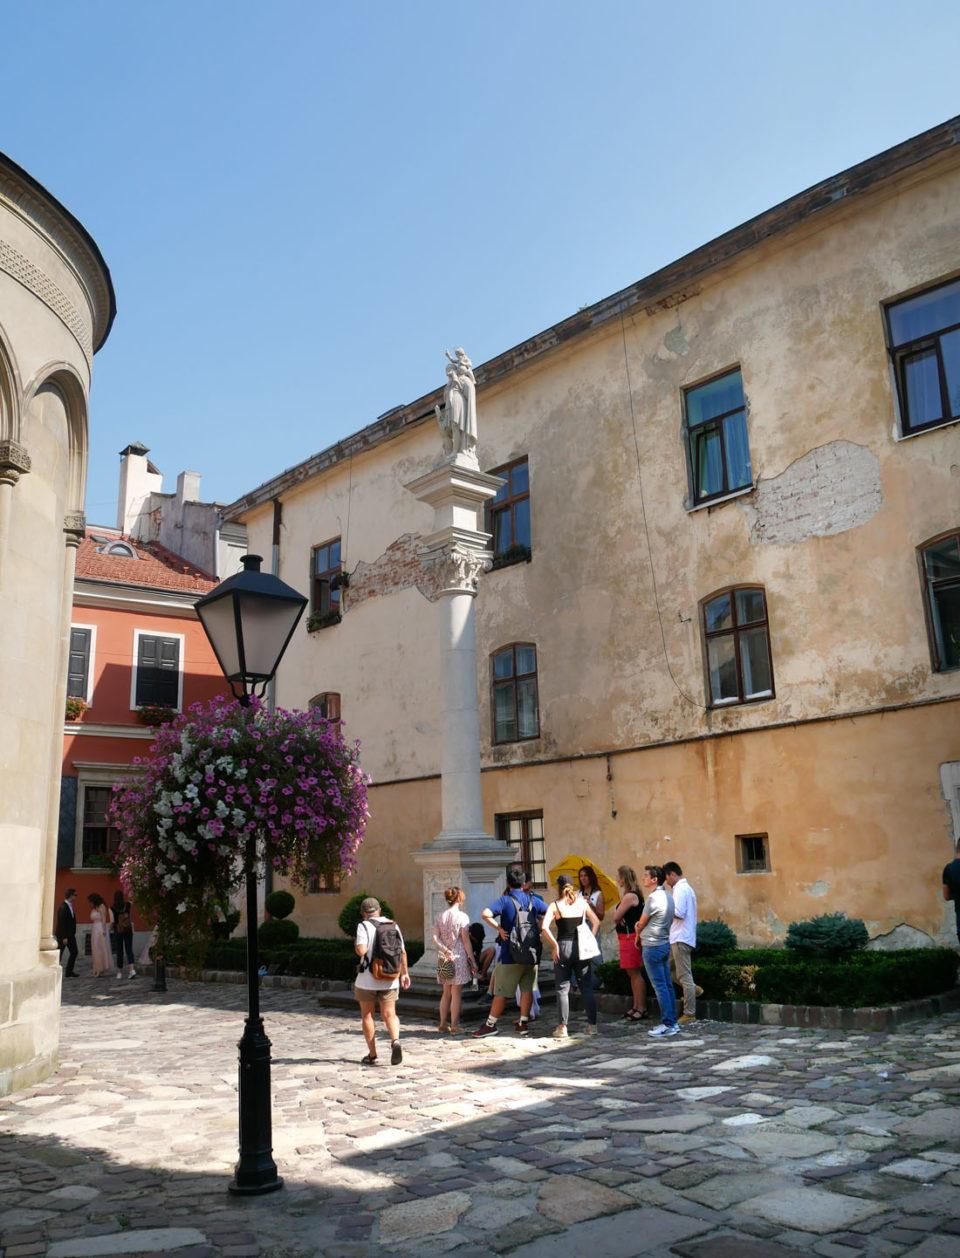 lwiw kloster innenhof